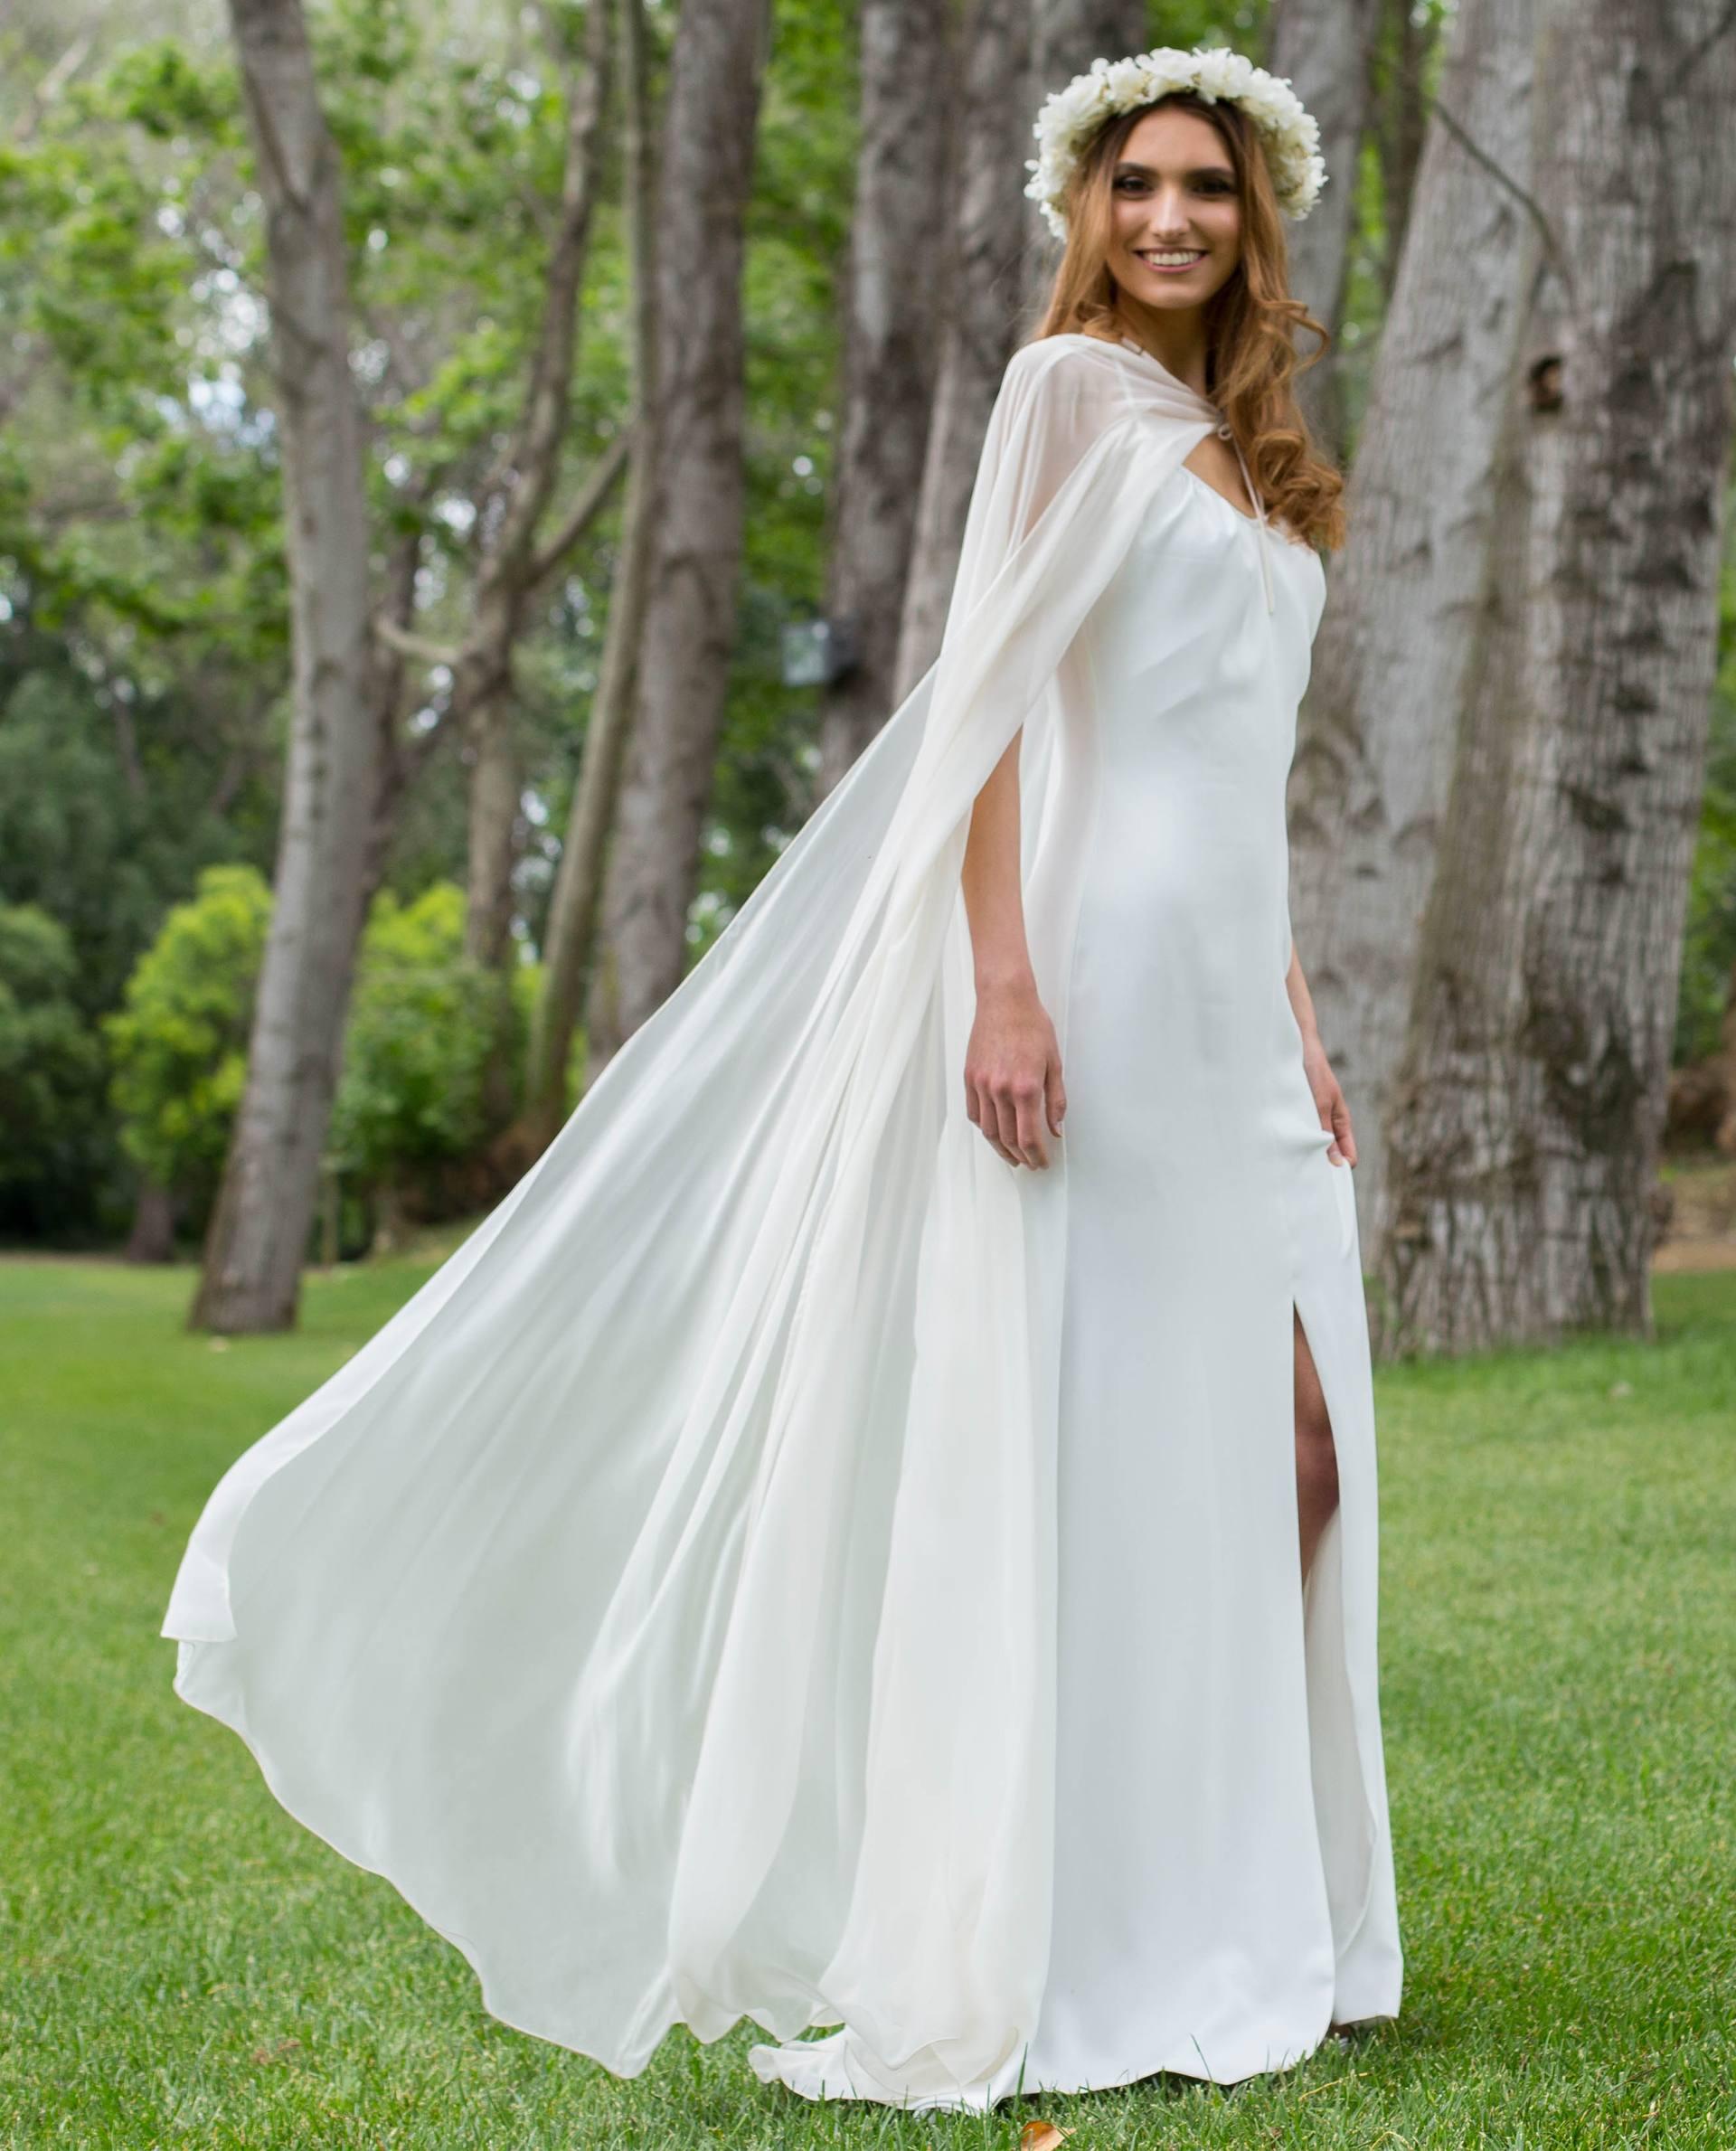 BRIDAL-NATURE 2017/18 - VESTIDOS - Vestido novia Rebeca con capa Nelda